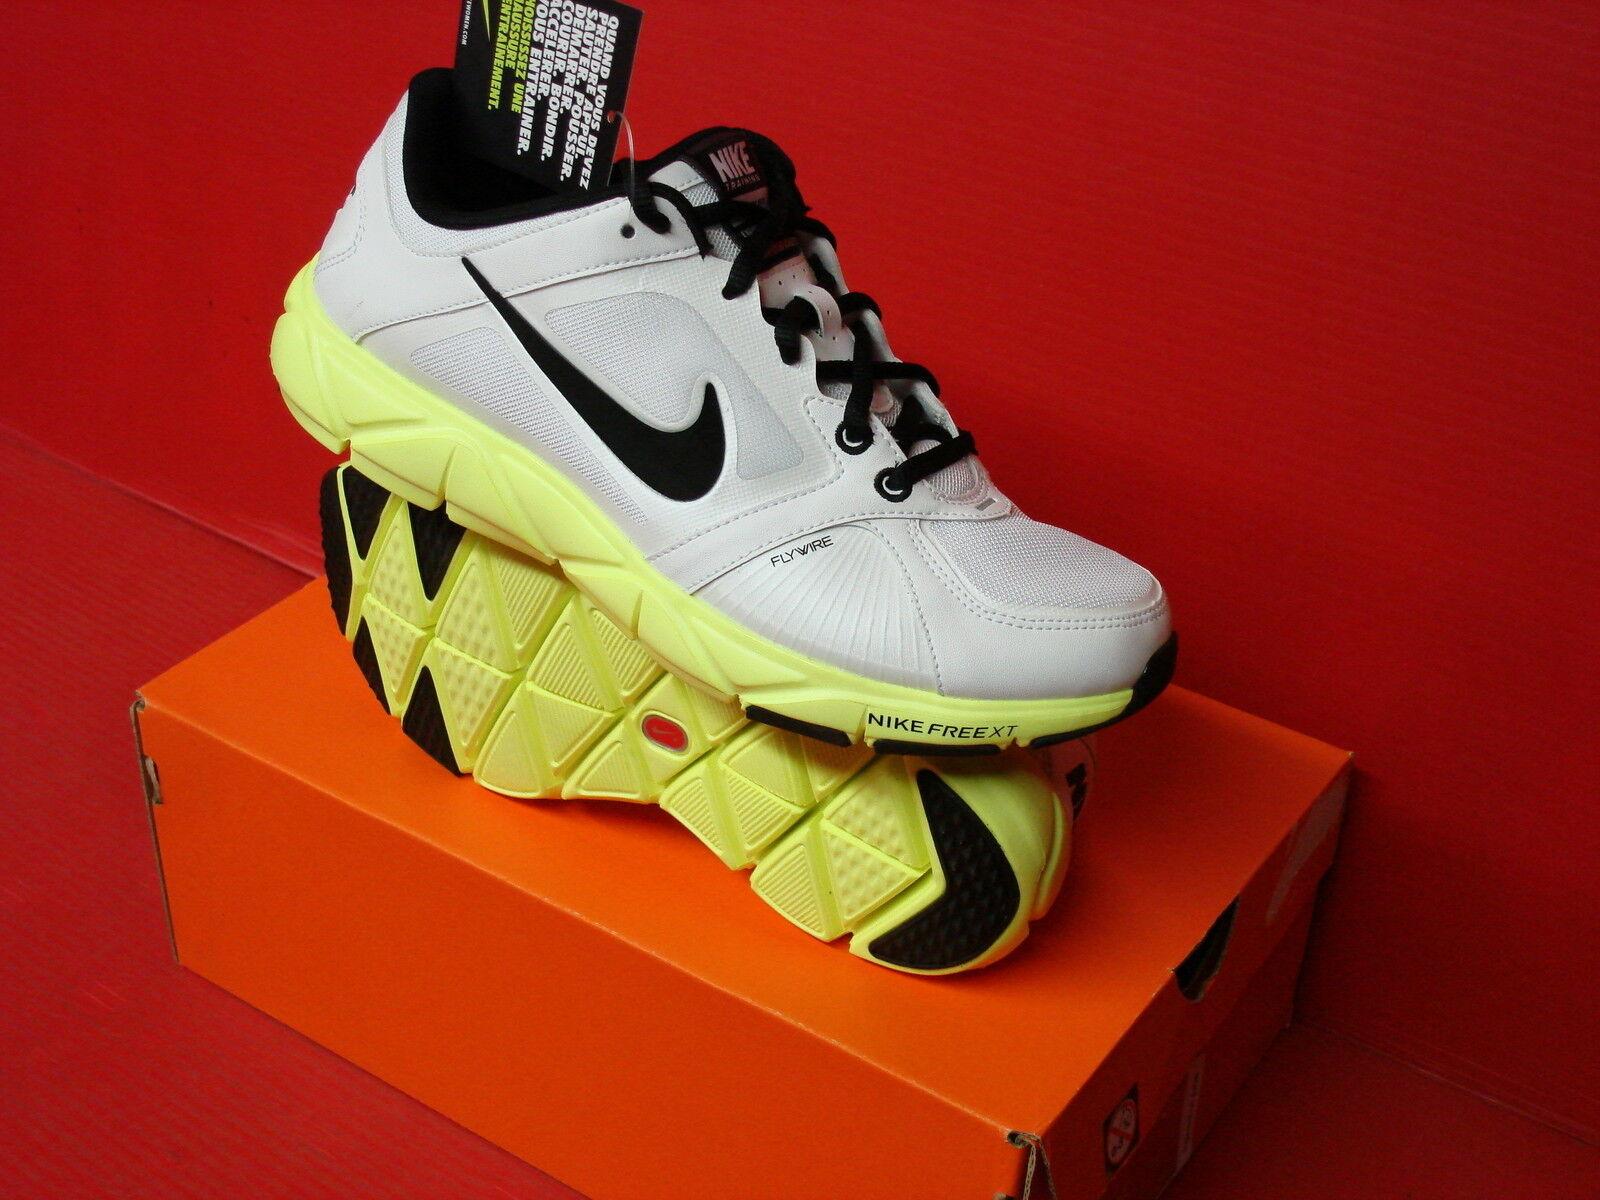 Donne 9 nike shox atletico croce bianco scarpa - rosso 343747-161 scarpa bianco e89036